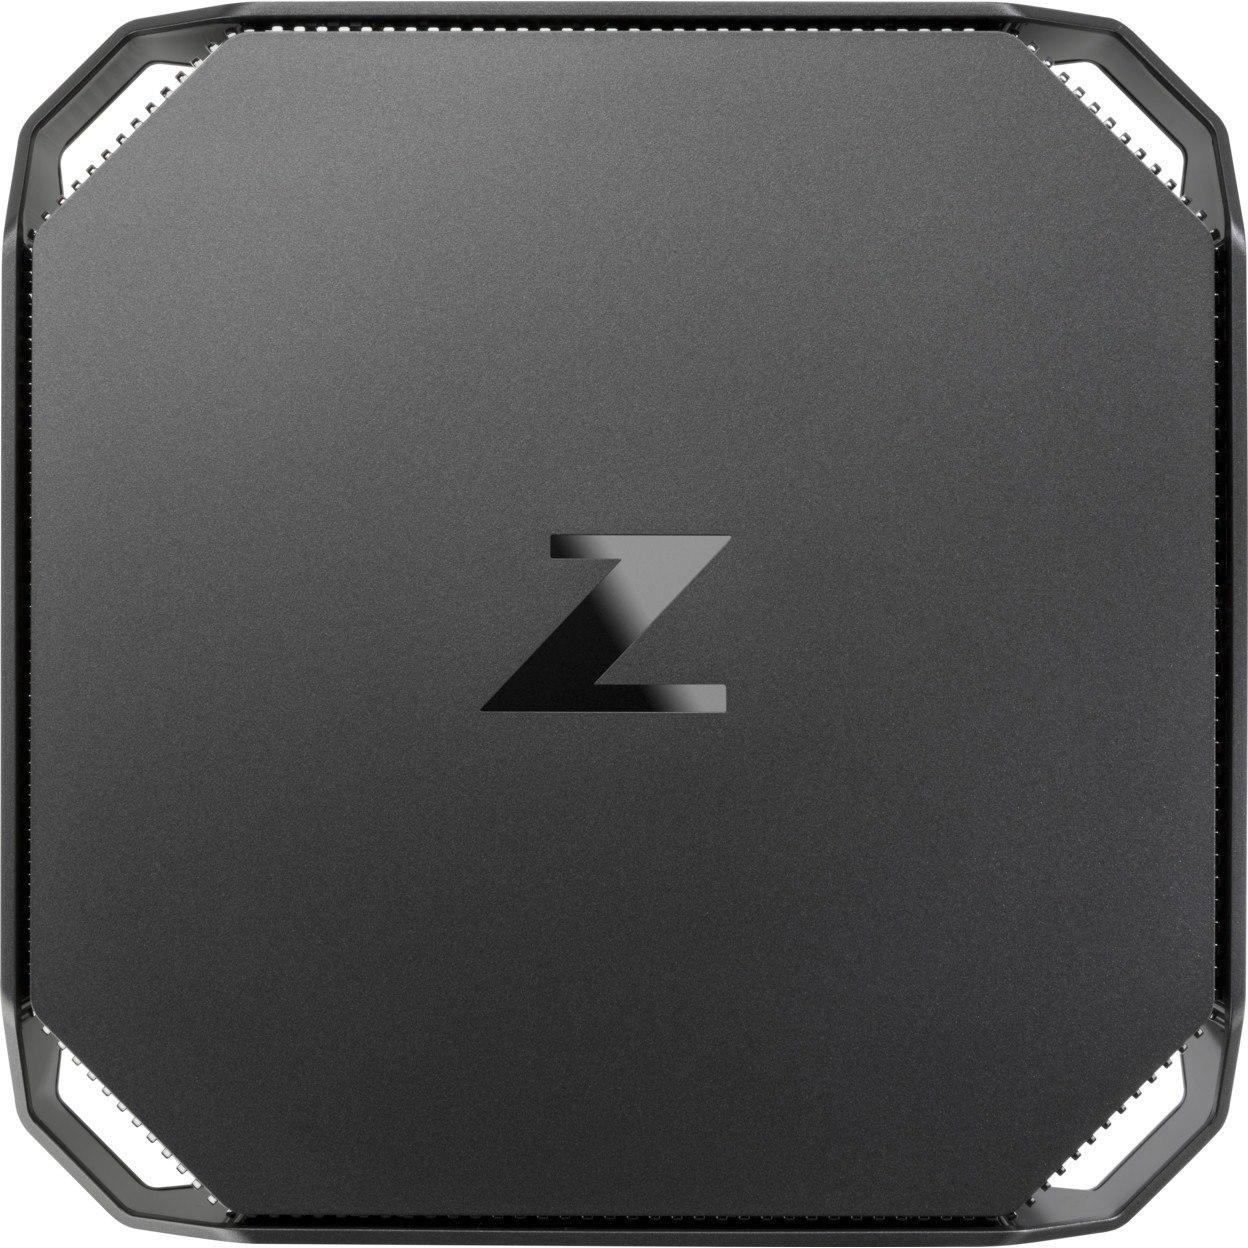 HP Z2 Mini G4 Workstation - 1 x Xeon E-2276G - 32 GB RAM - 1 TB HDD - 512 GB SSD - Mini PC - Space Gray, Black Chrome Accent